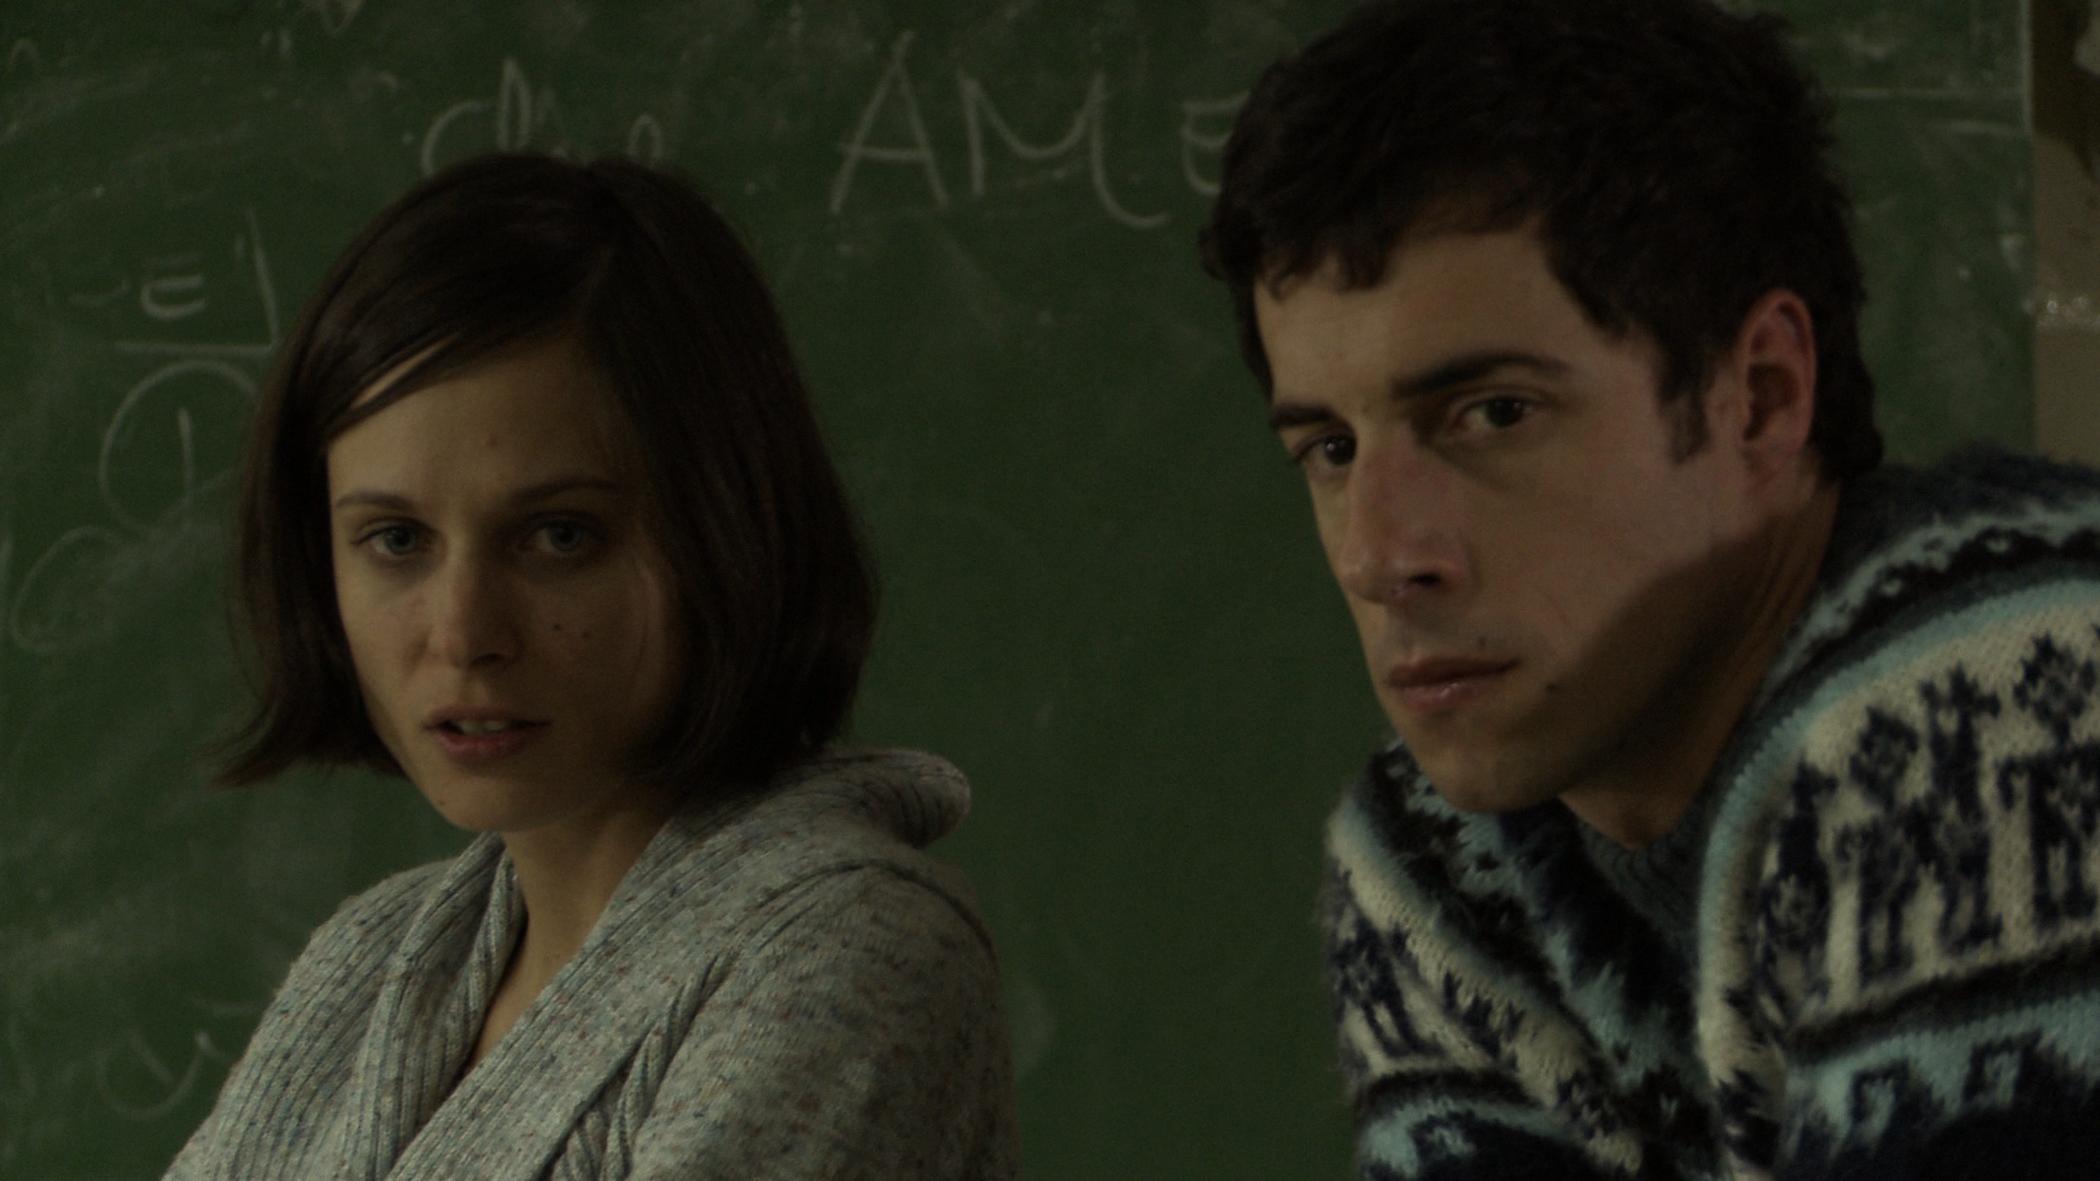 Lo studente: Esteban Lamothe con Romina Paula in una scena